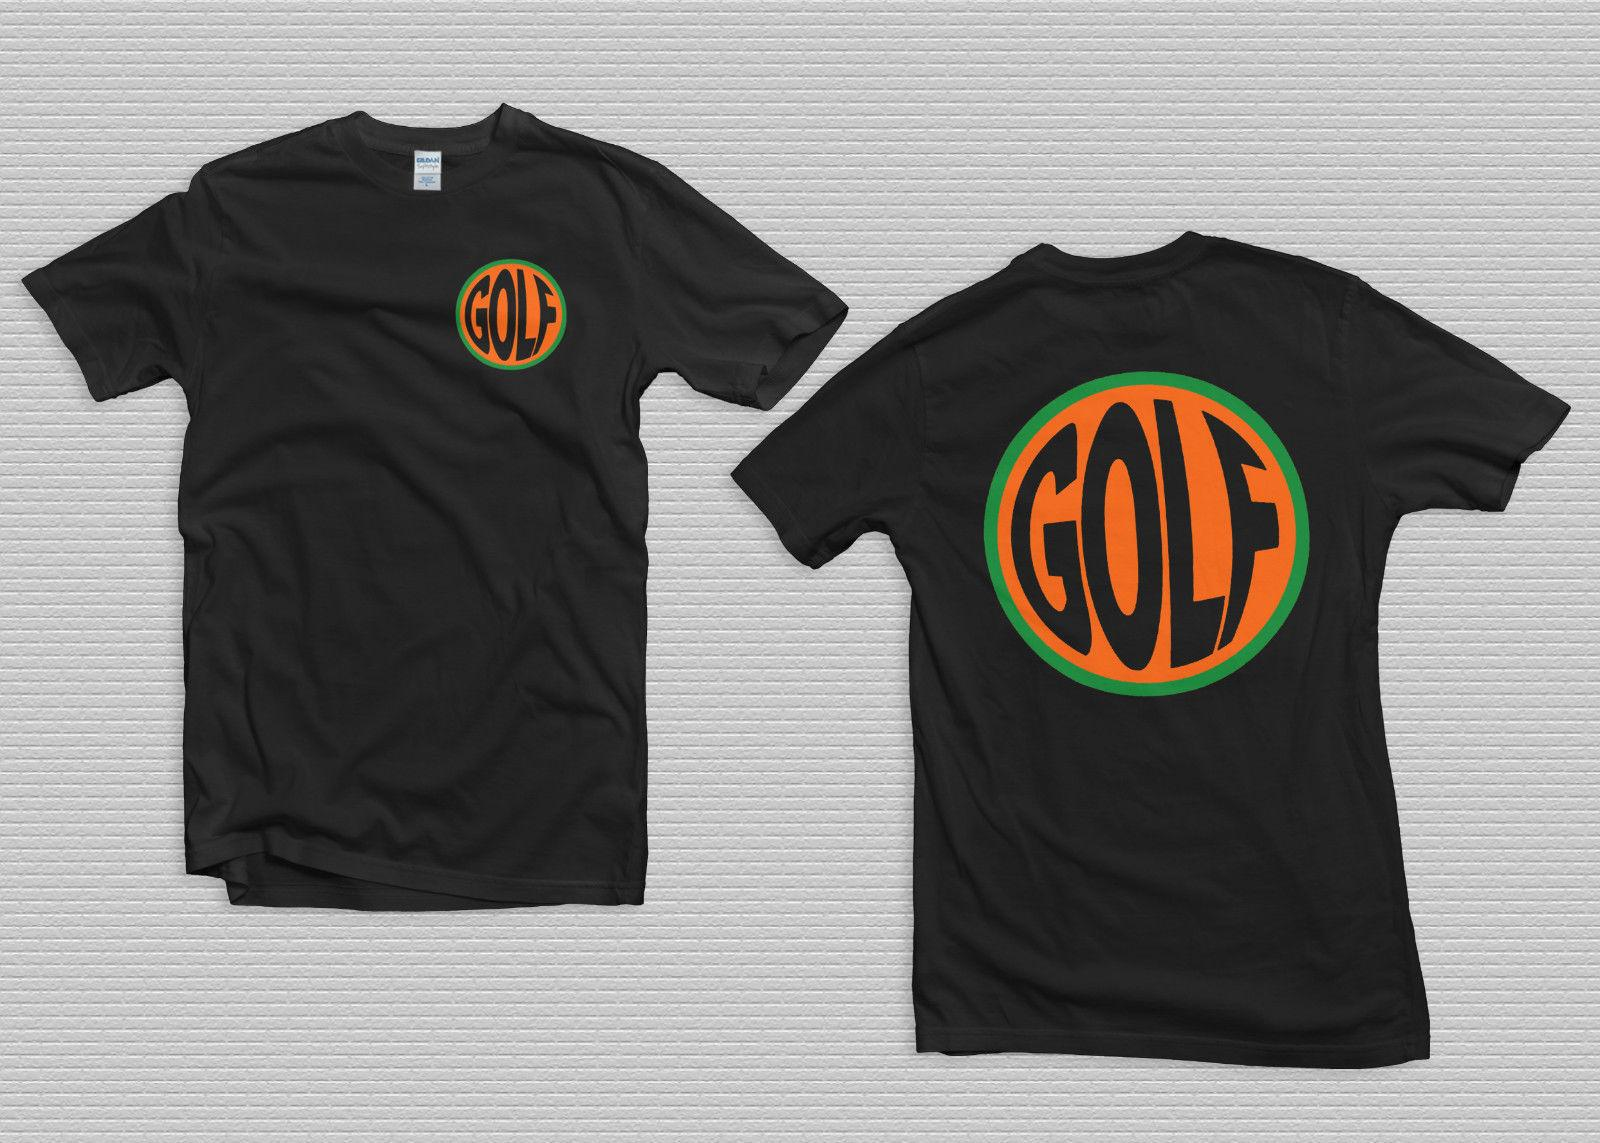 f19d04288f6f Golf Wang Fish Eye Tee Shirt Small Tyler The Creator Black Size S 2XL Summer  Hot Sale New Tee Print Men T Shirt Top 100% Cotton Cool Interesting T  Shirts T ...